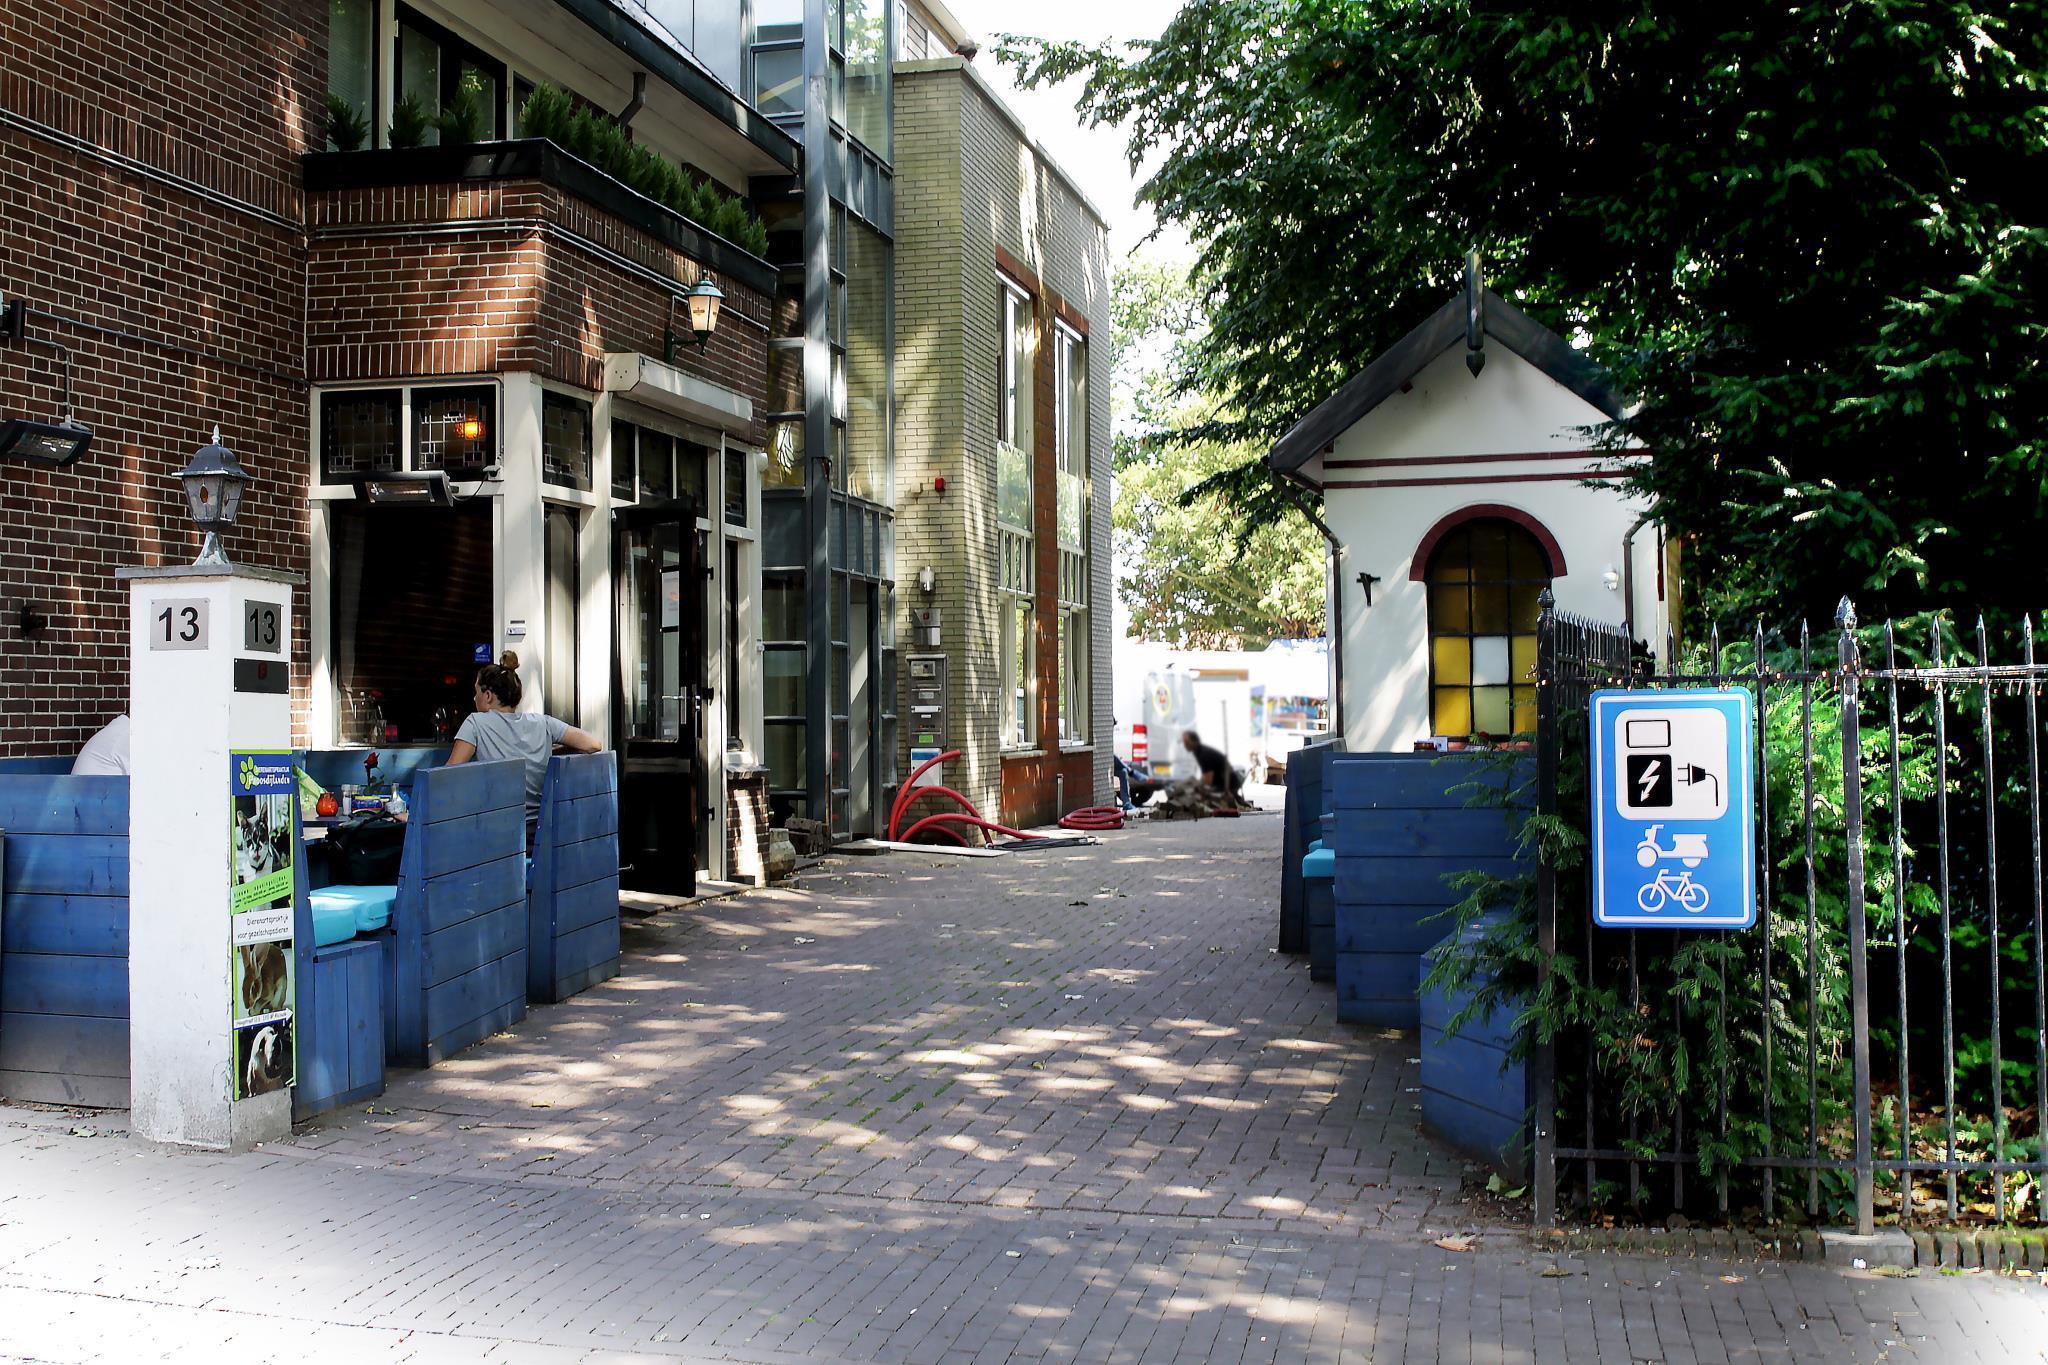 Hotel Restaurant Cafe Koekenbier Abcoude, Abcoude